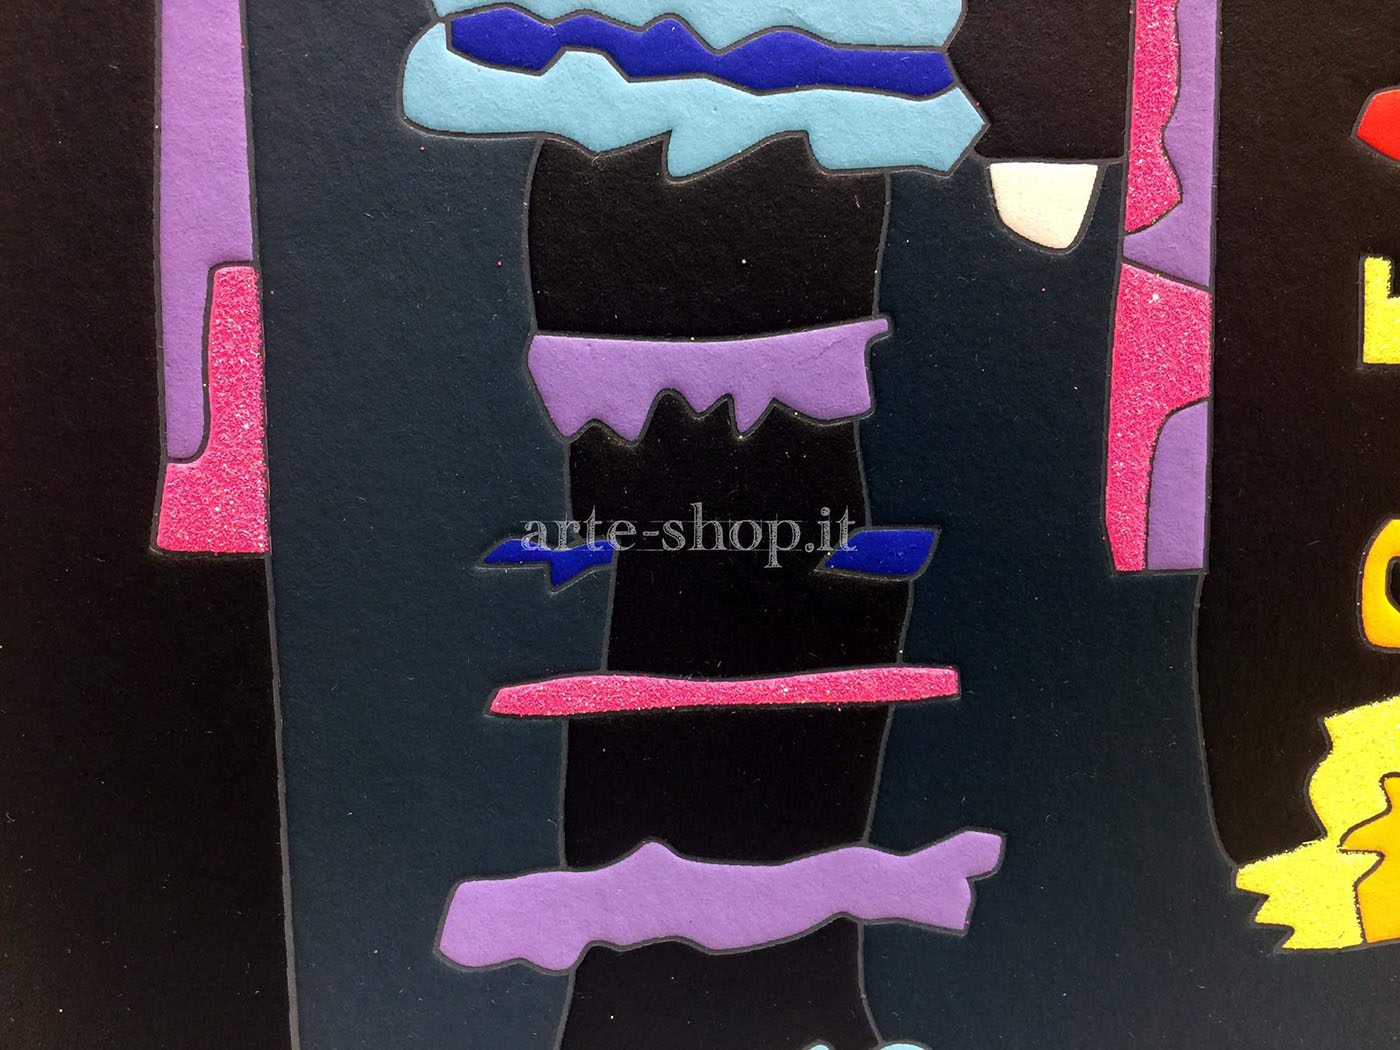 arte pentagono shop dettaglio numero 235